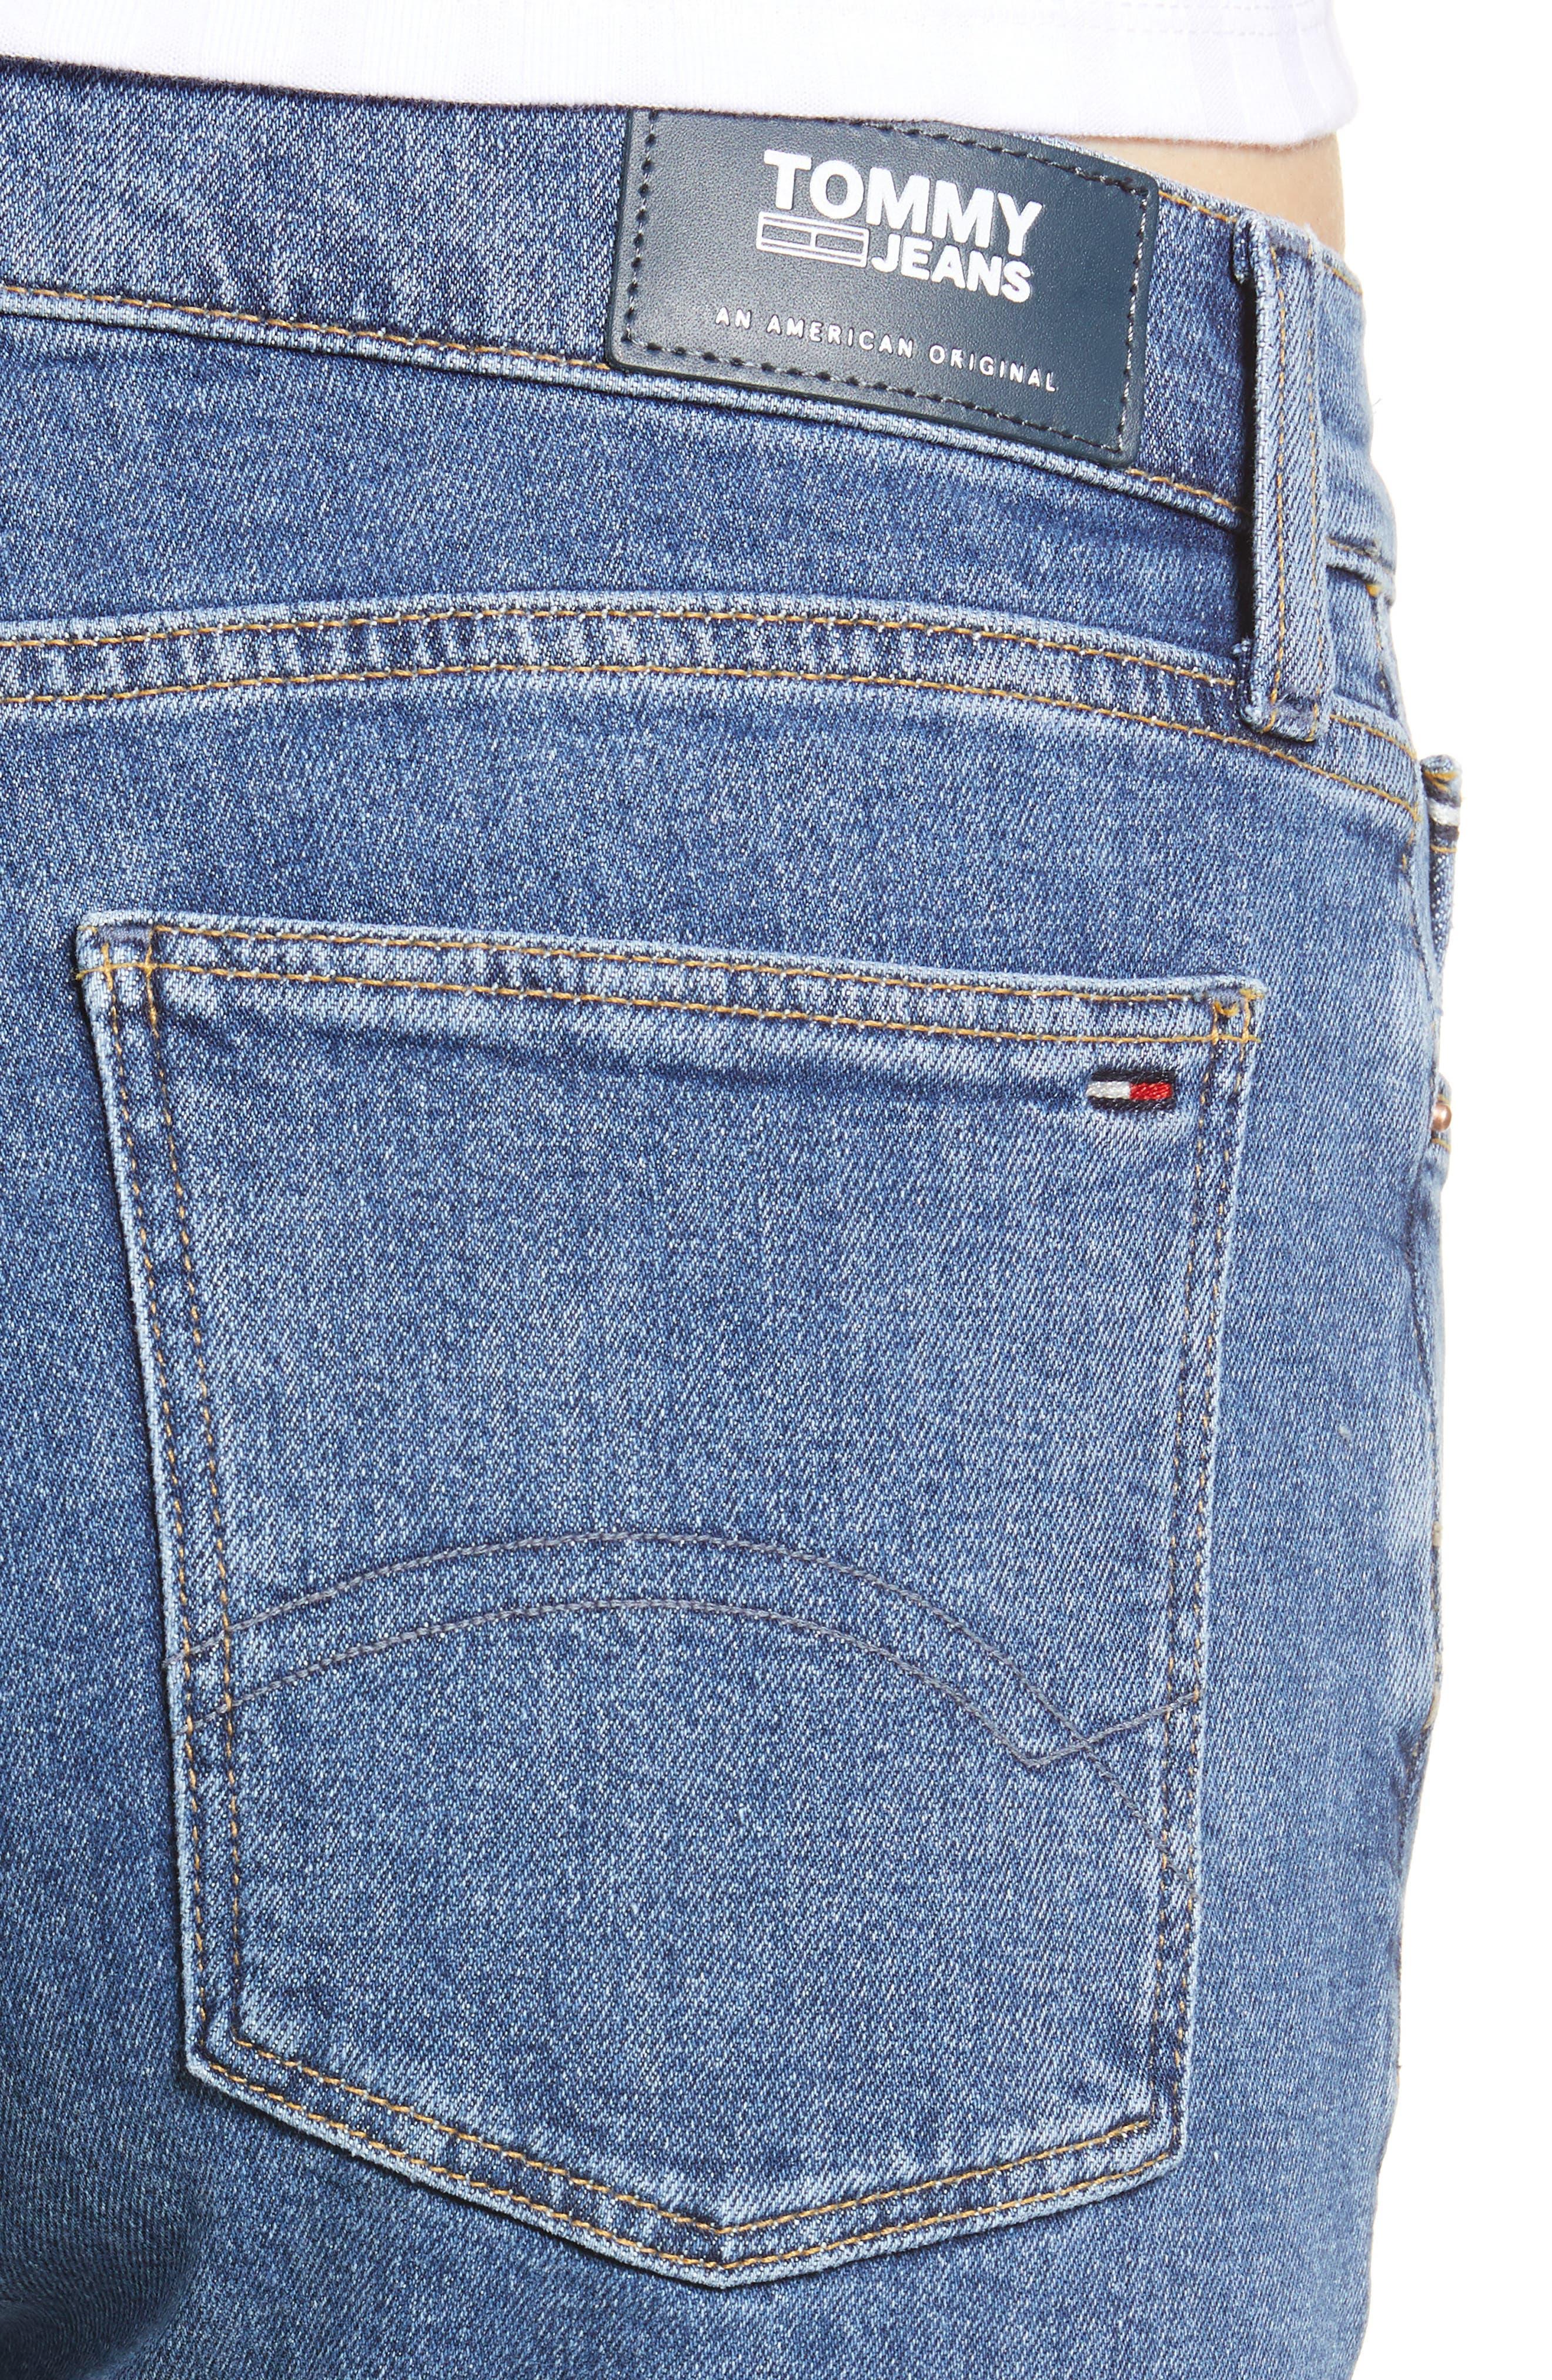 Izzy High Rise Center Seam Slim Jeans,                             Alternate thumbnail 4, color,                             400